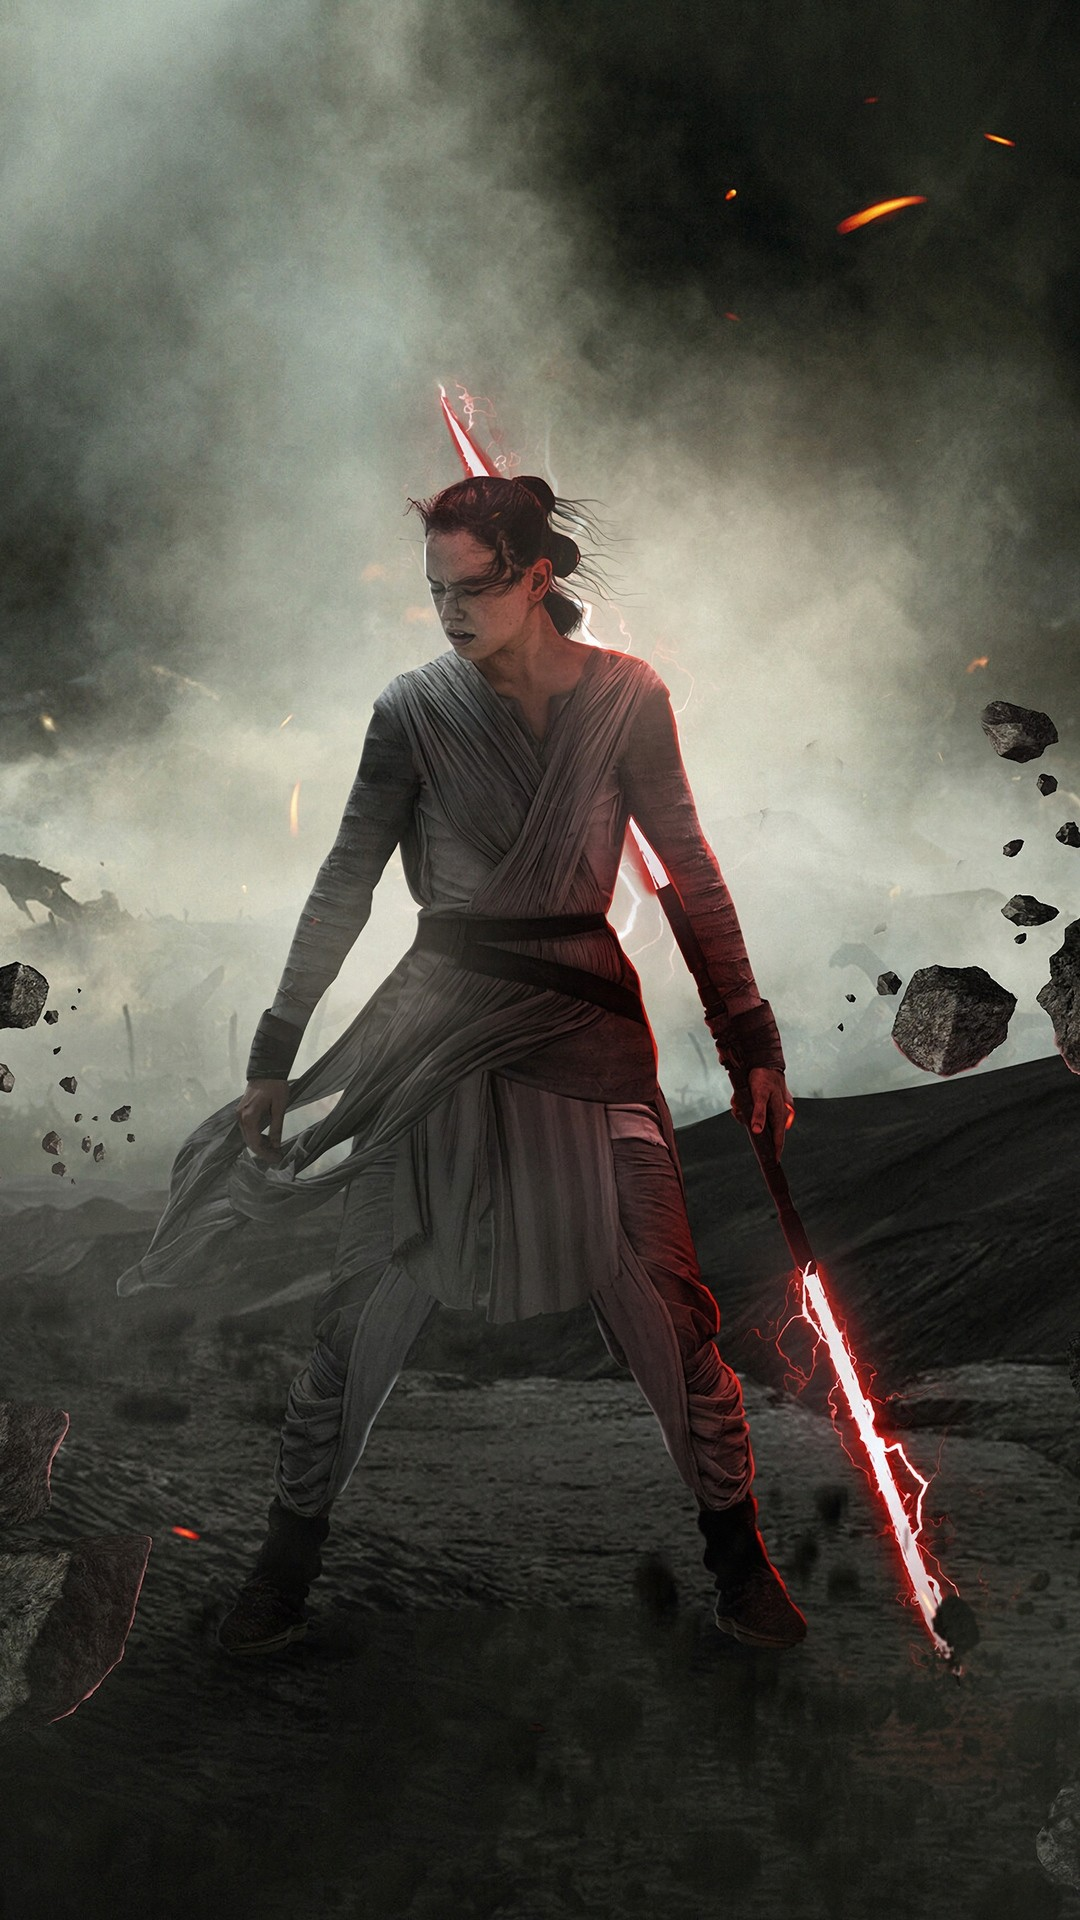 Star Wars The Rise Of Skywalker phone wallpaper hd